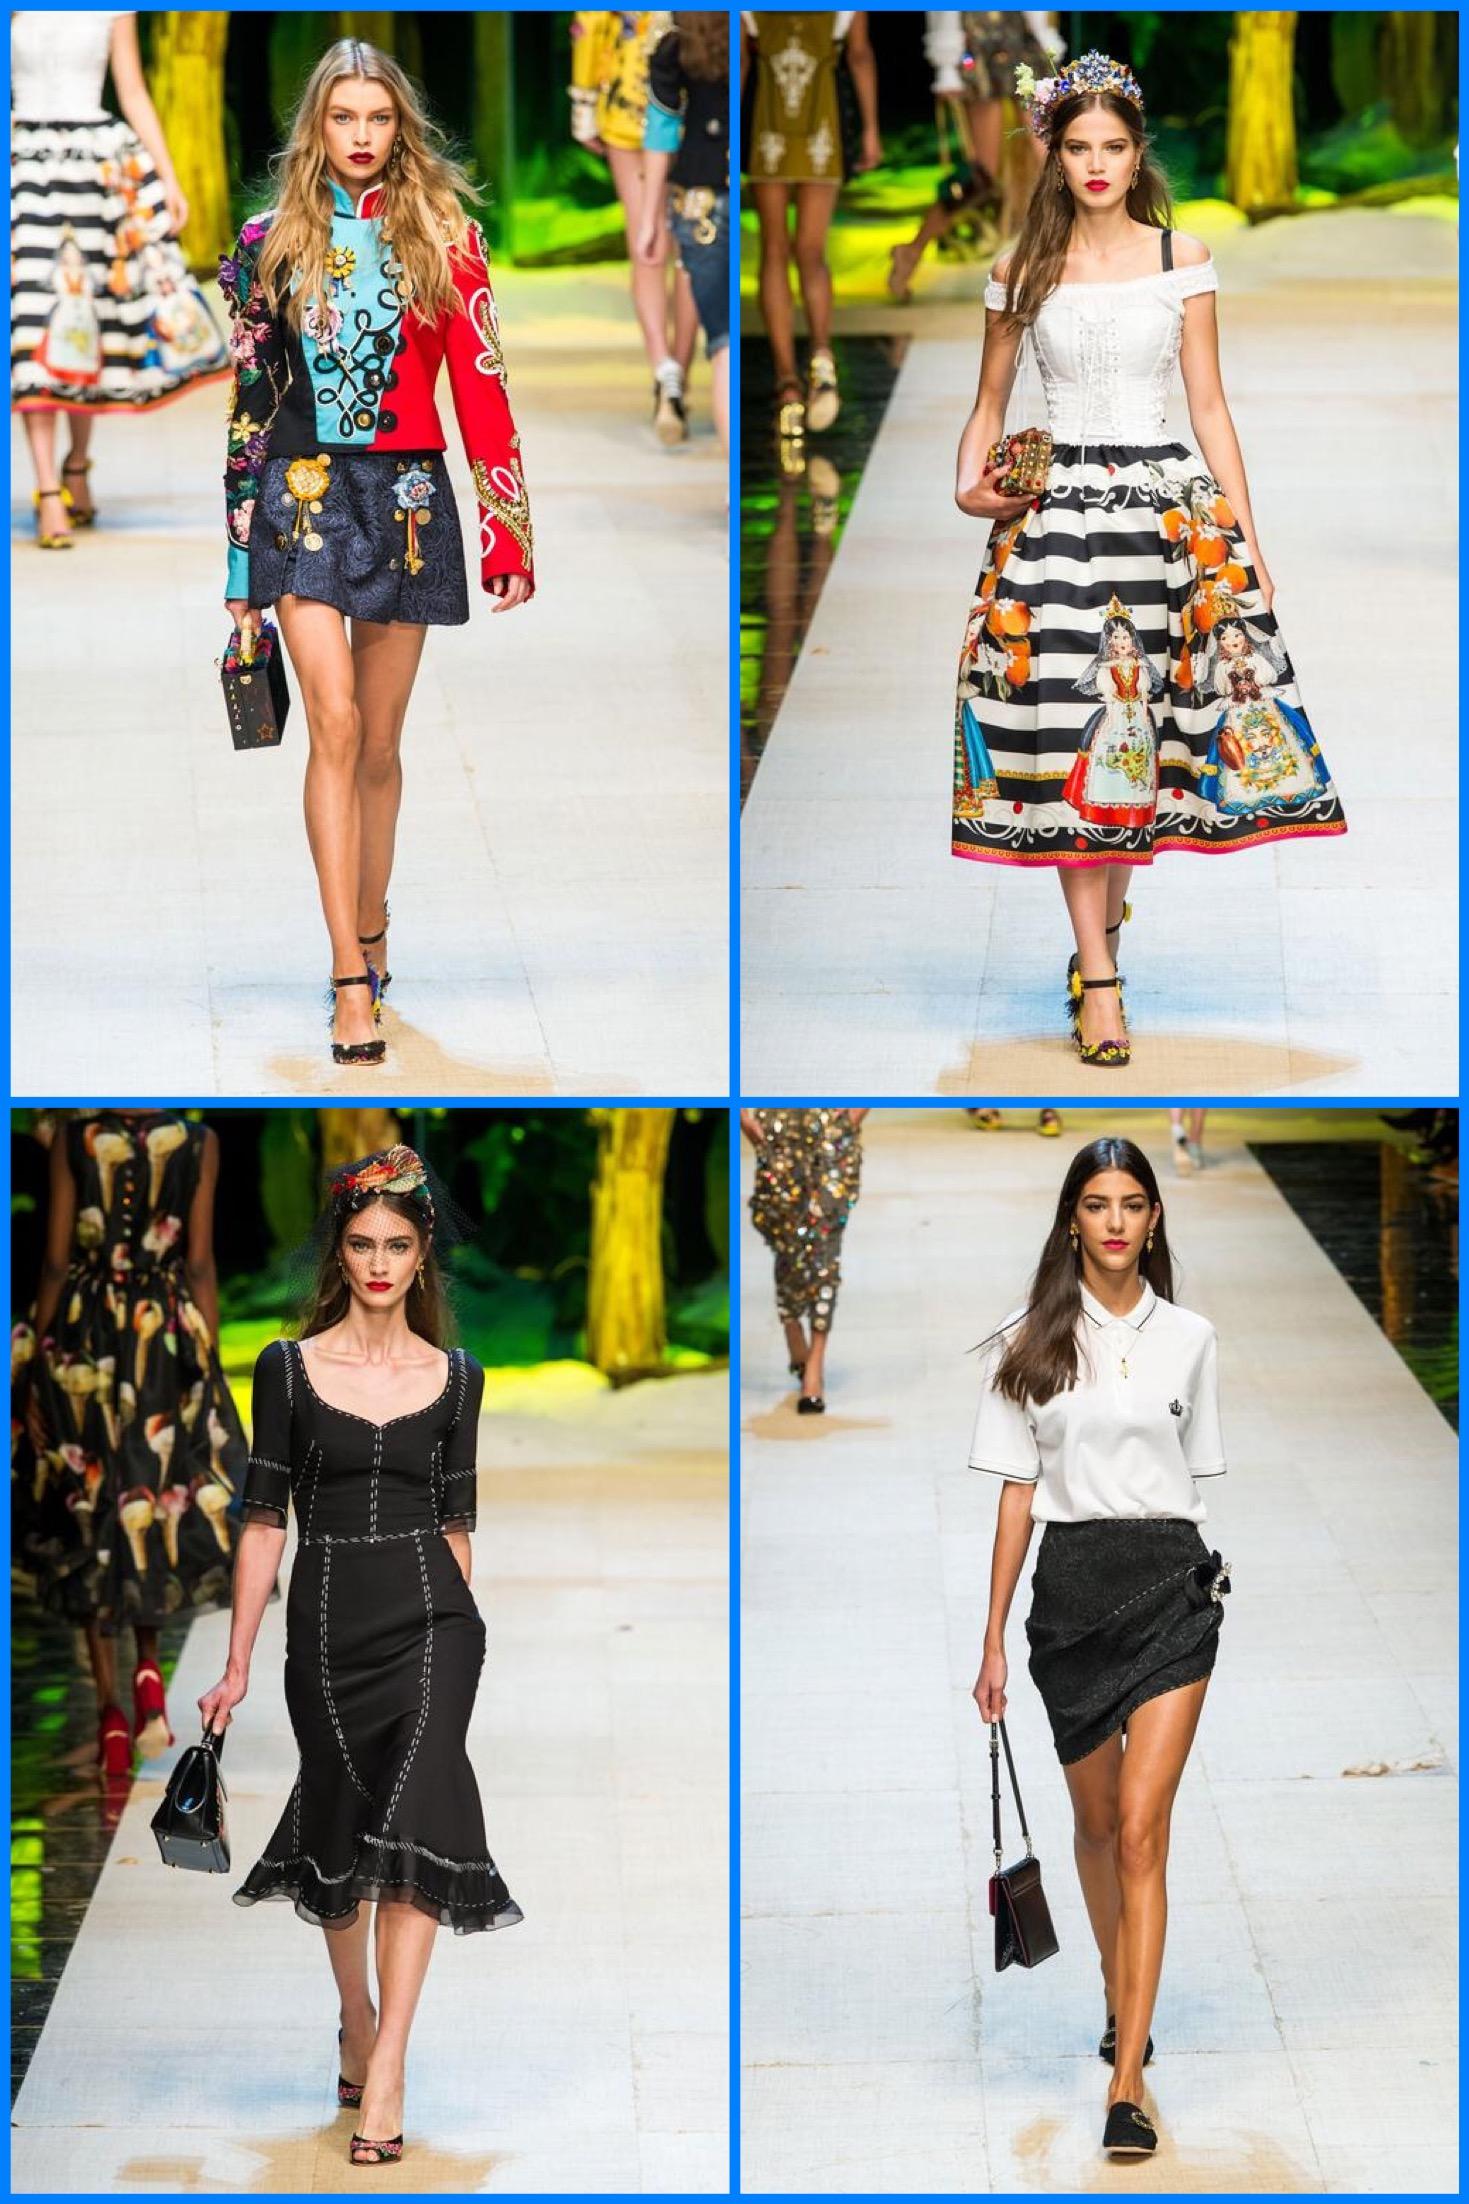 milano-fashion-week-pret-a-porter-spring-summer-2017-style-dolce-gabbana